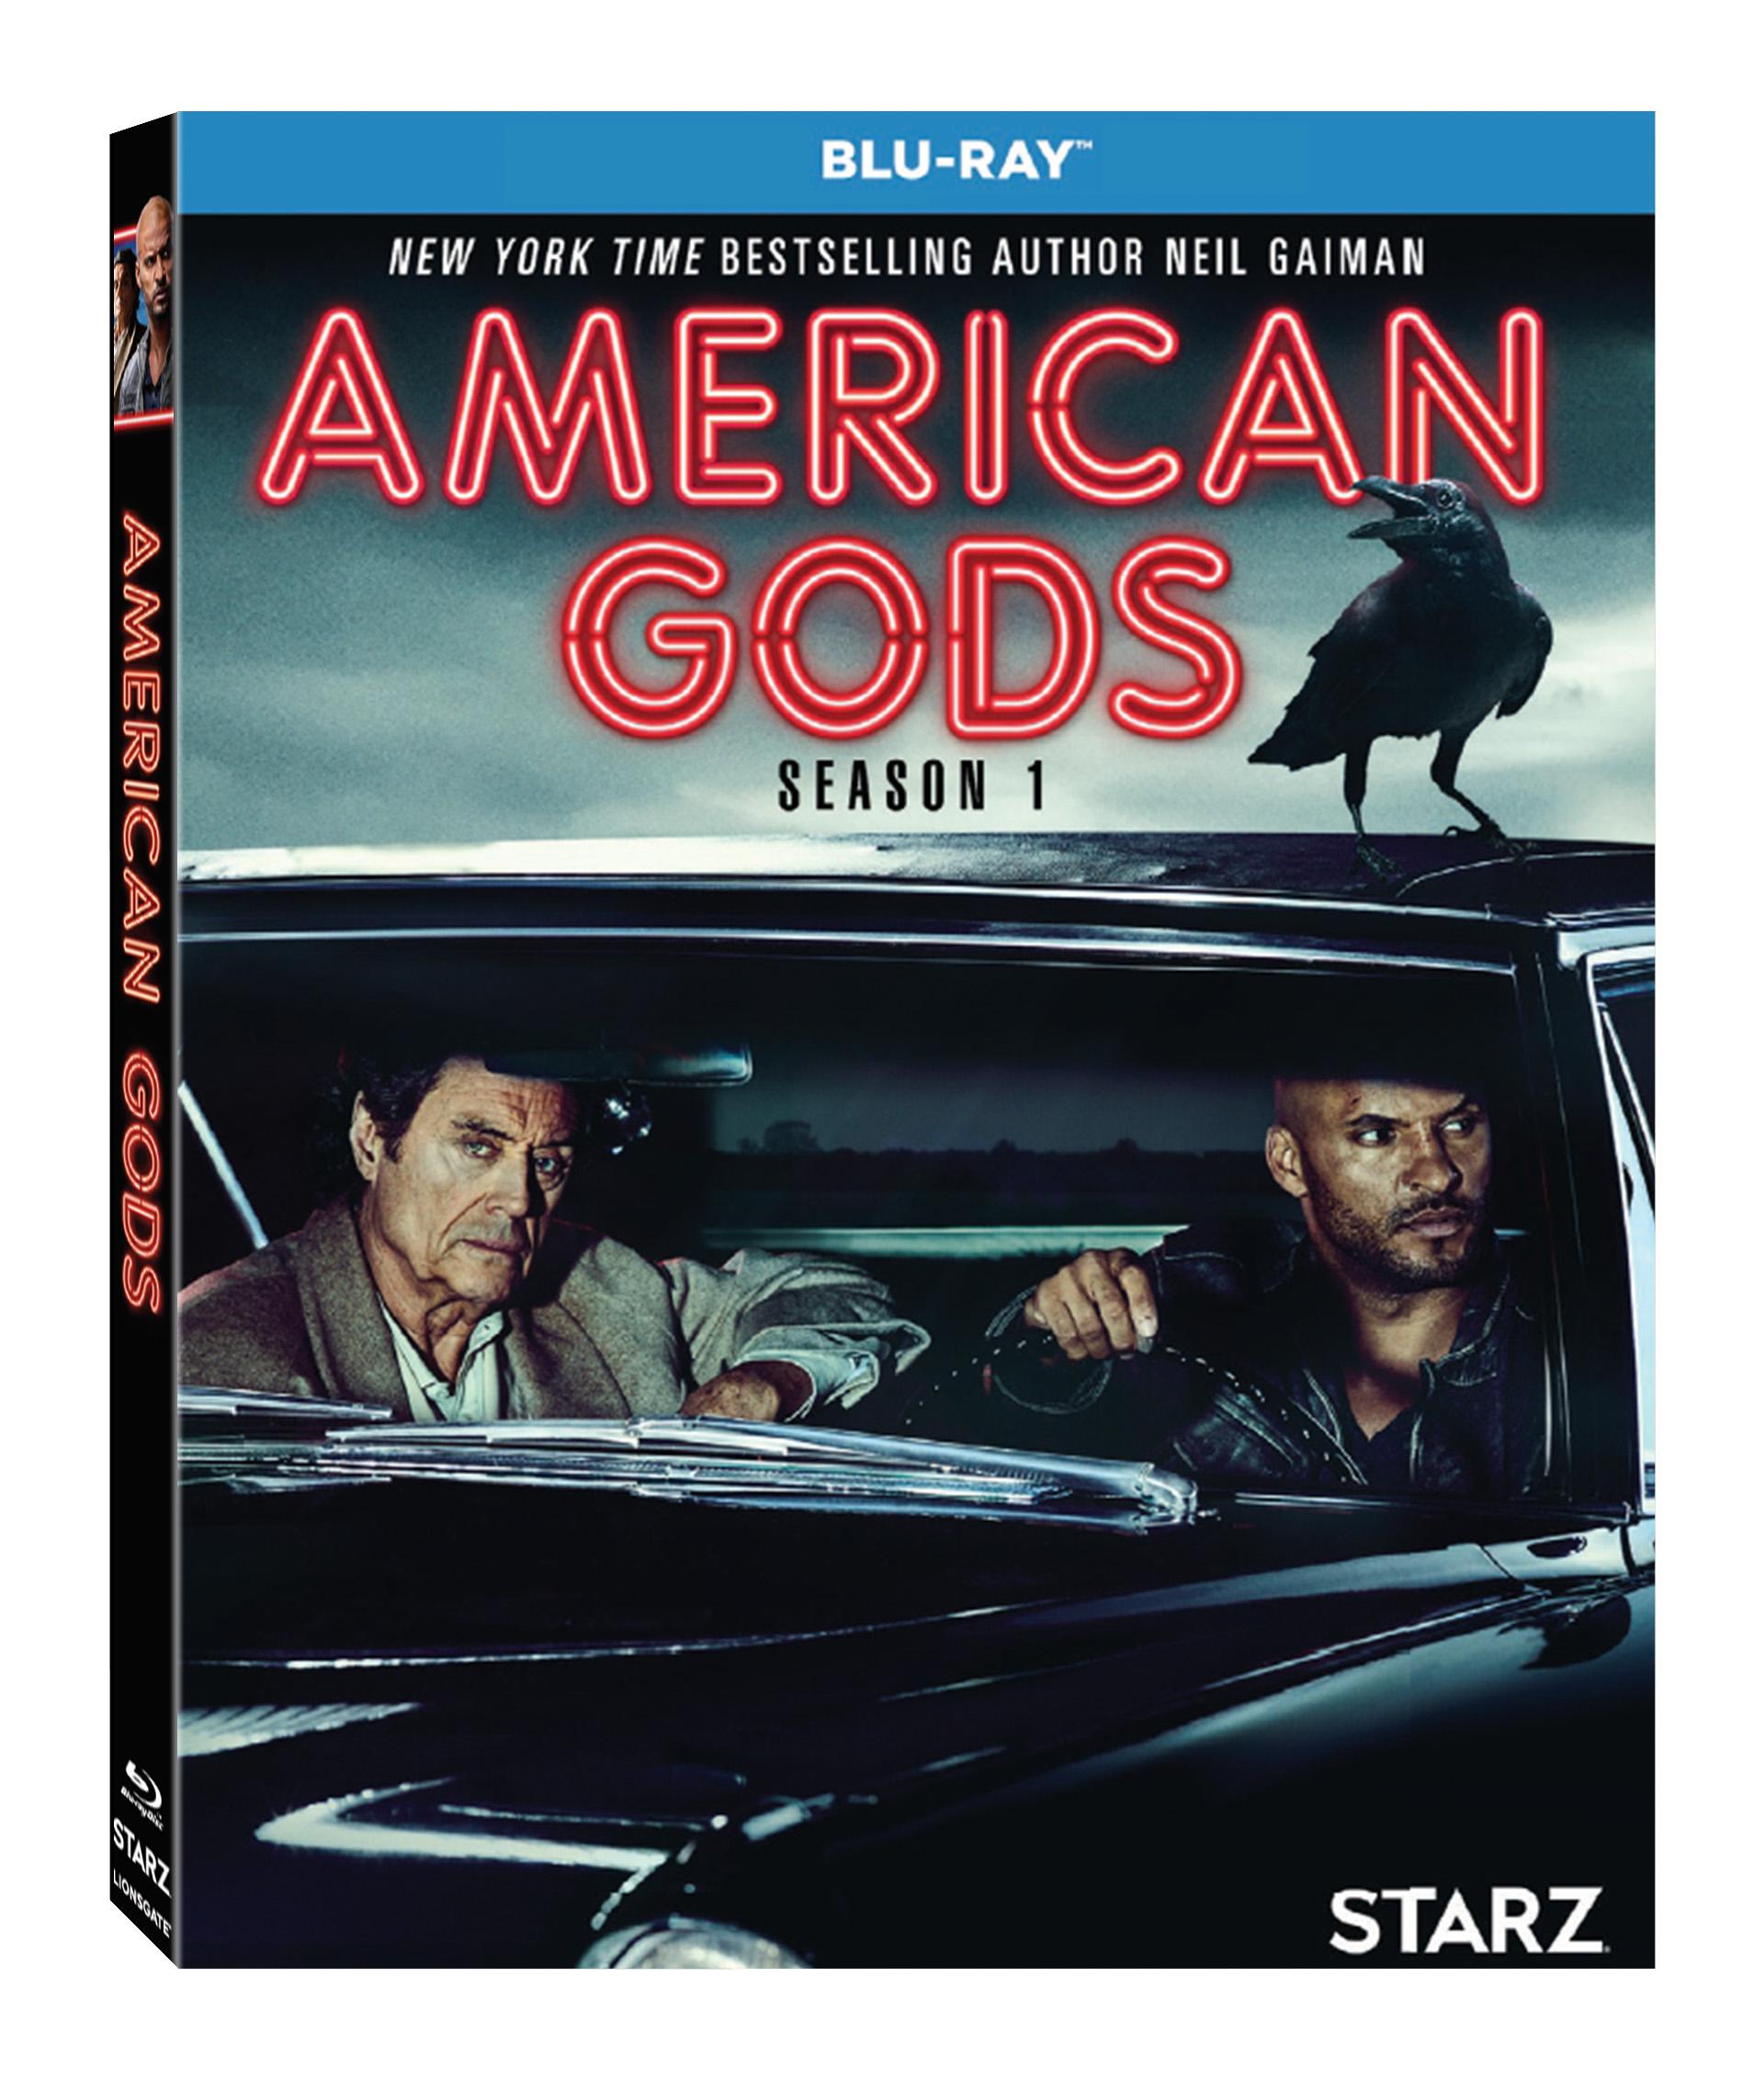 American Gods, Season One, DVD